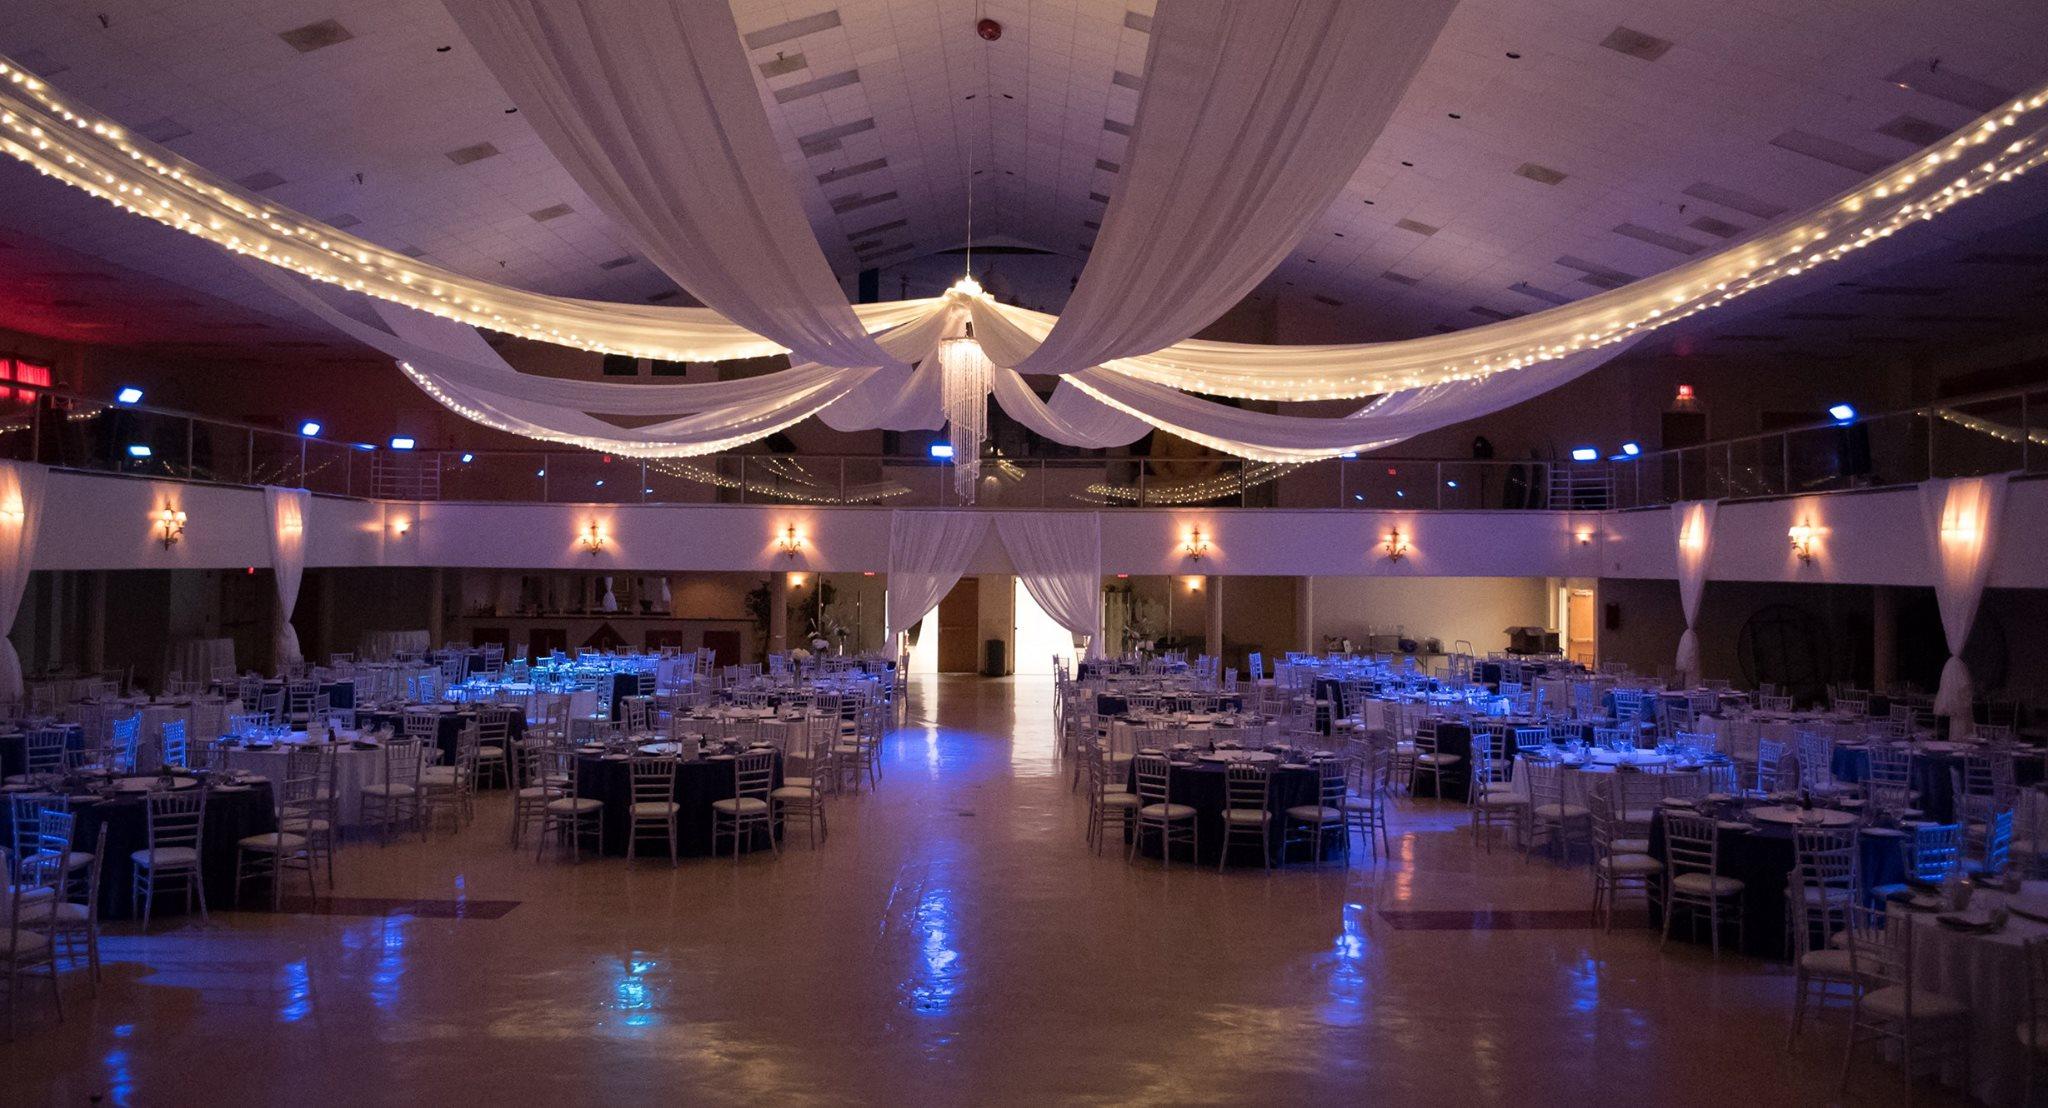 ICC - Address:5511 Lynn Rd, Tampa, FL 33624Phone: +1 813-264-4638Website:http://www.tampaicc.com